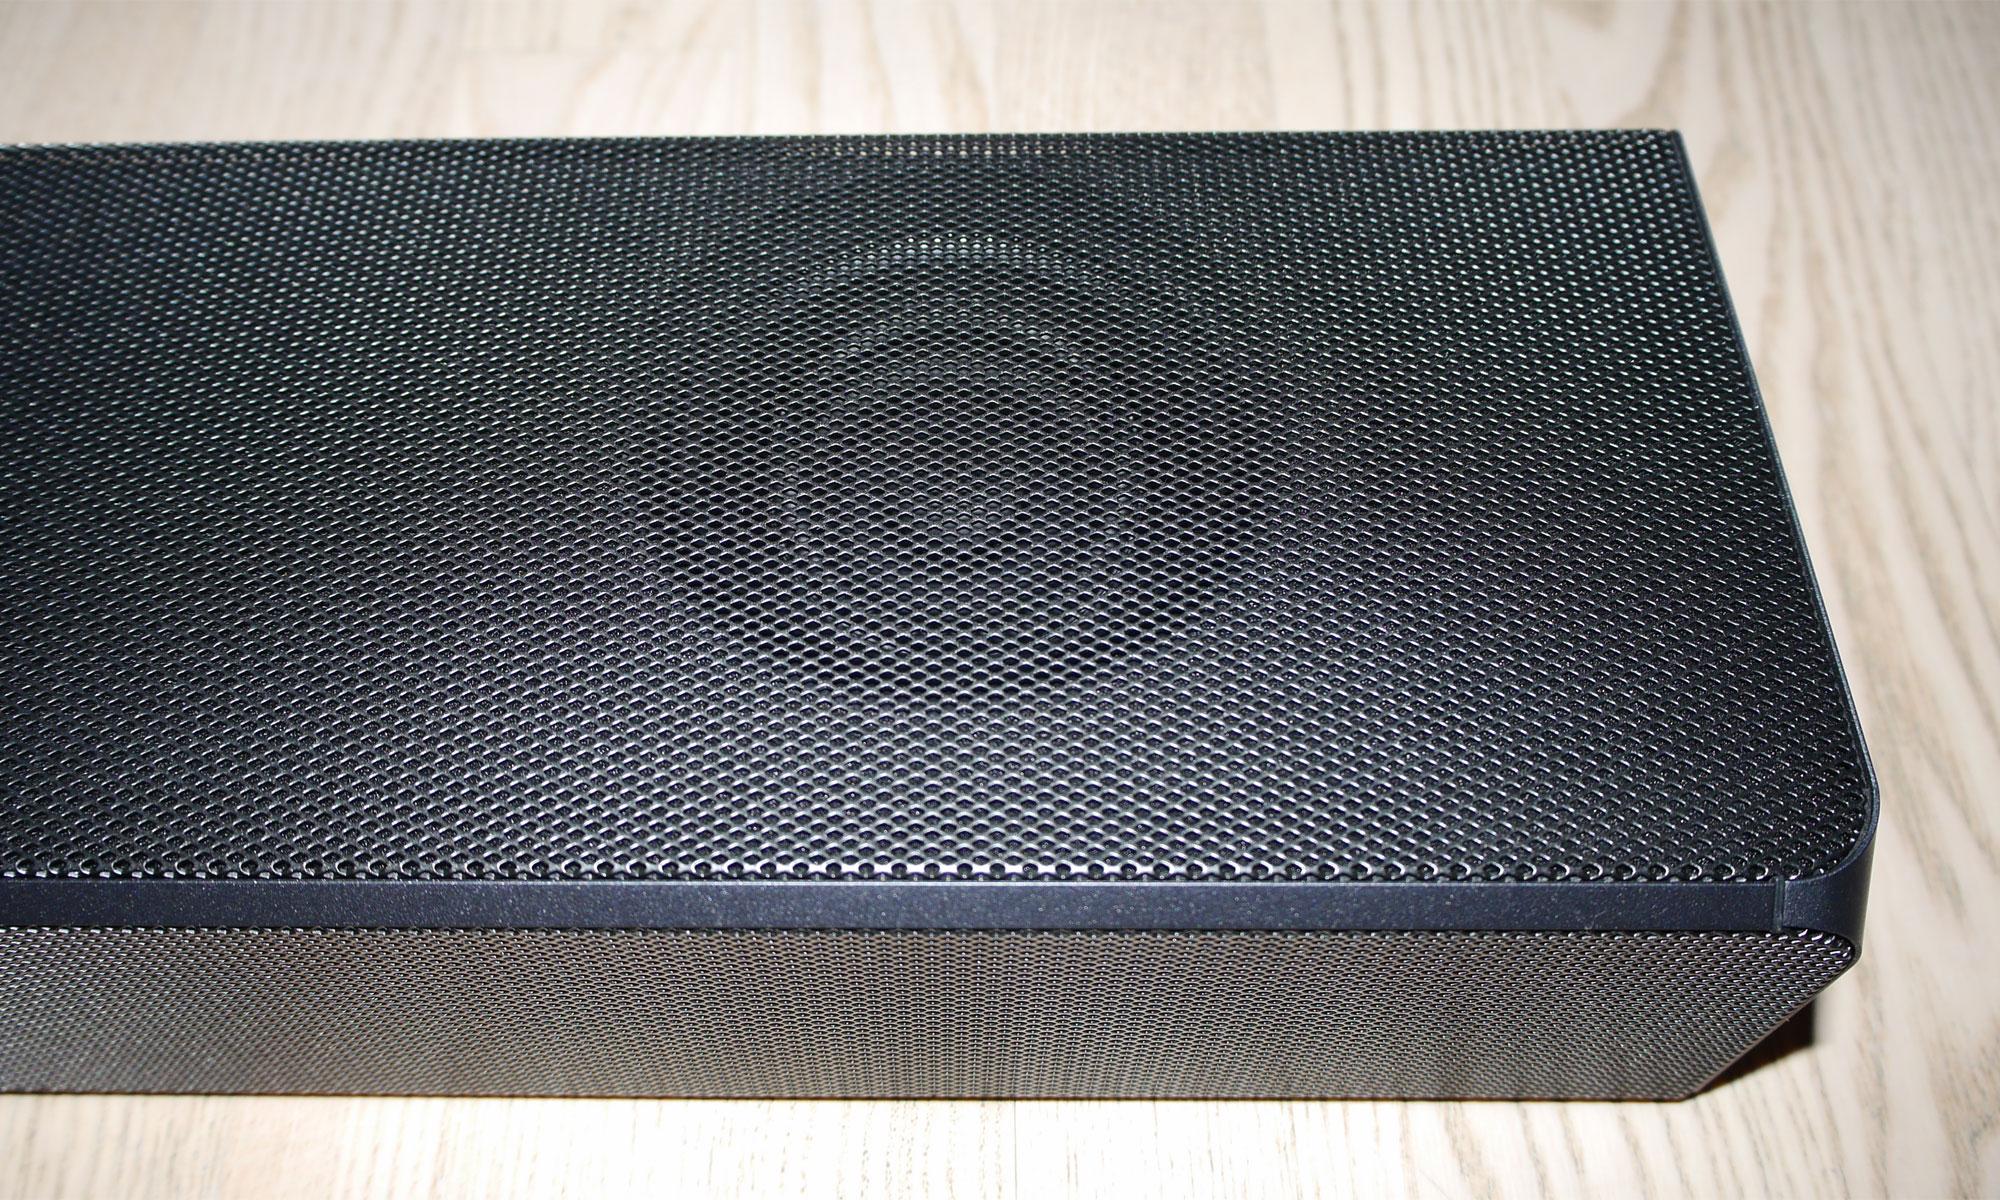 Hw-n960 Flatpanelsdk amp; atmos x Test - Samsung Dts